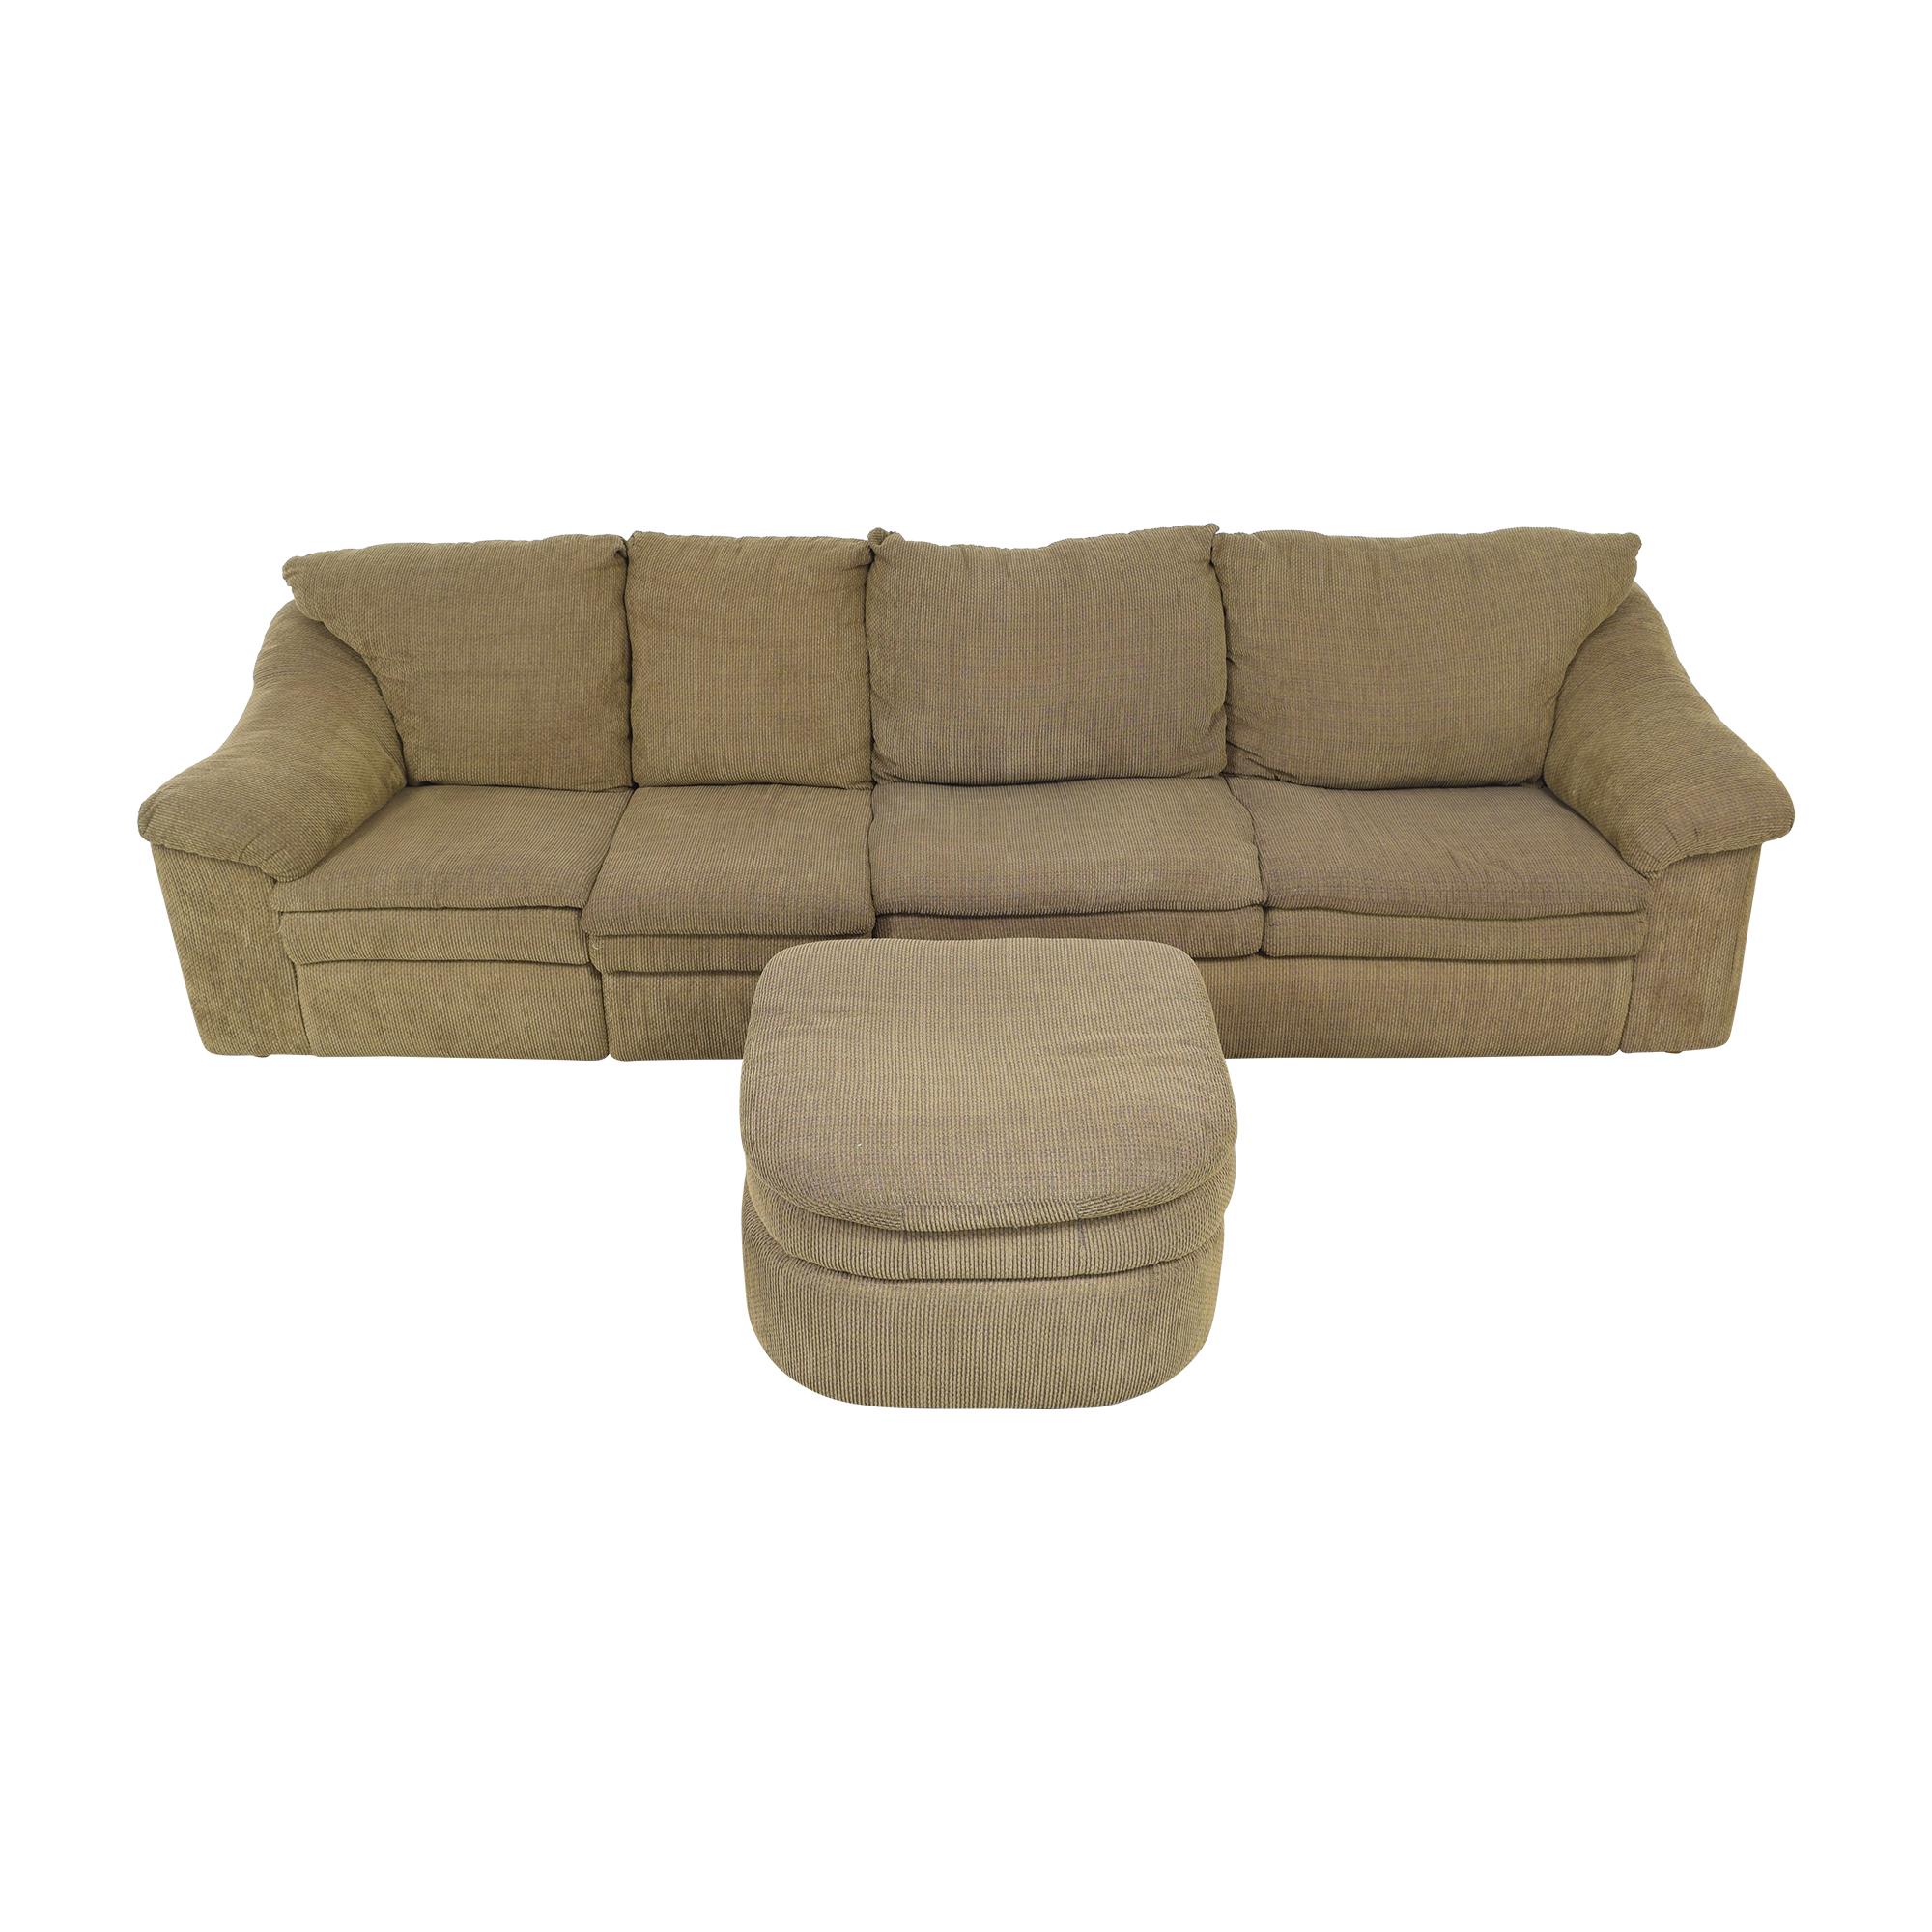 shop Raymour & Flanigan Raymour & Flanigan Sleeper Sofa with Ottoman online